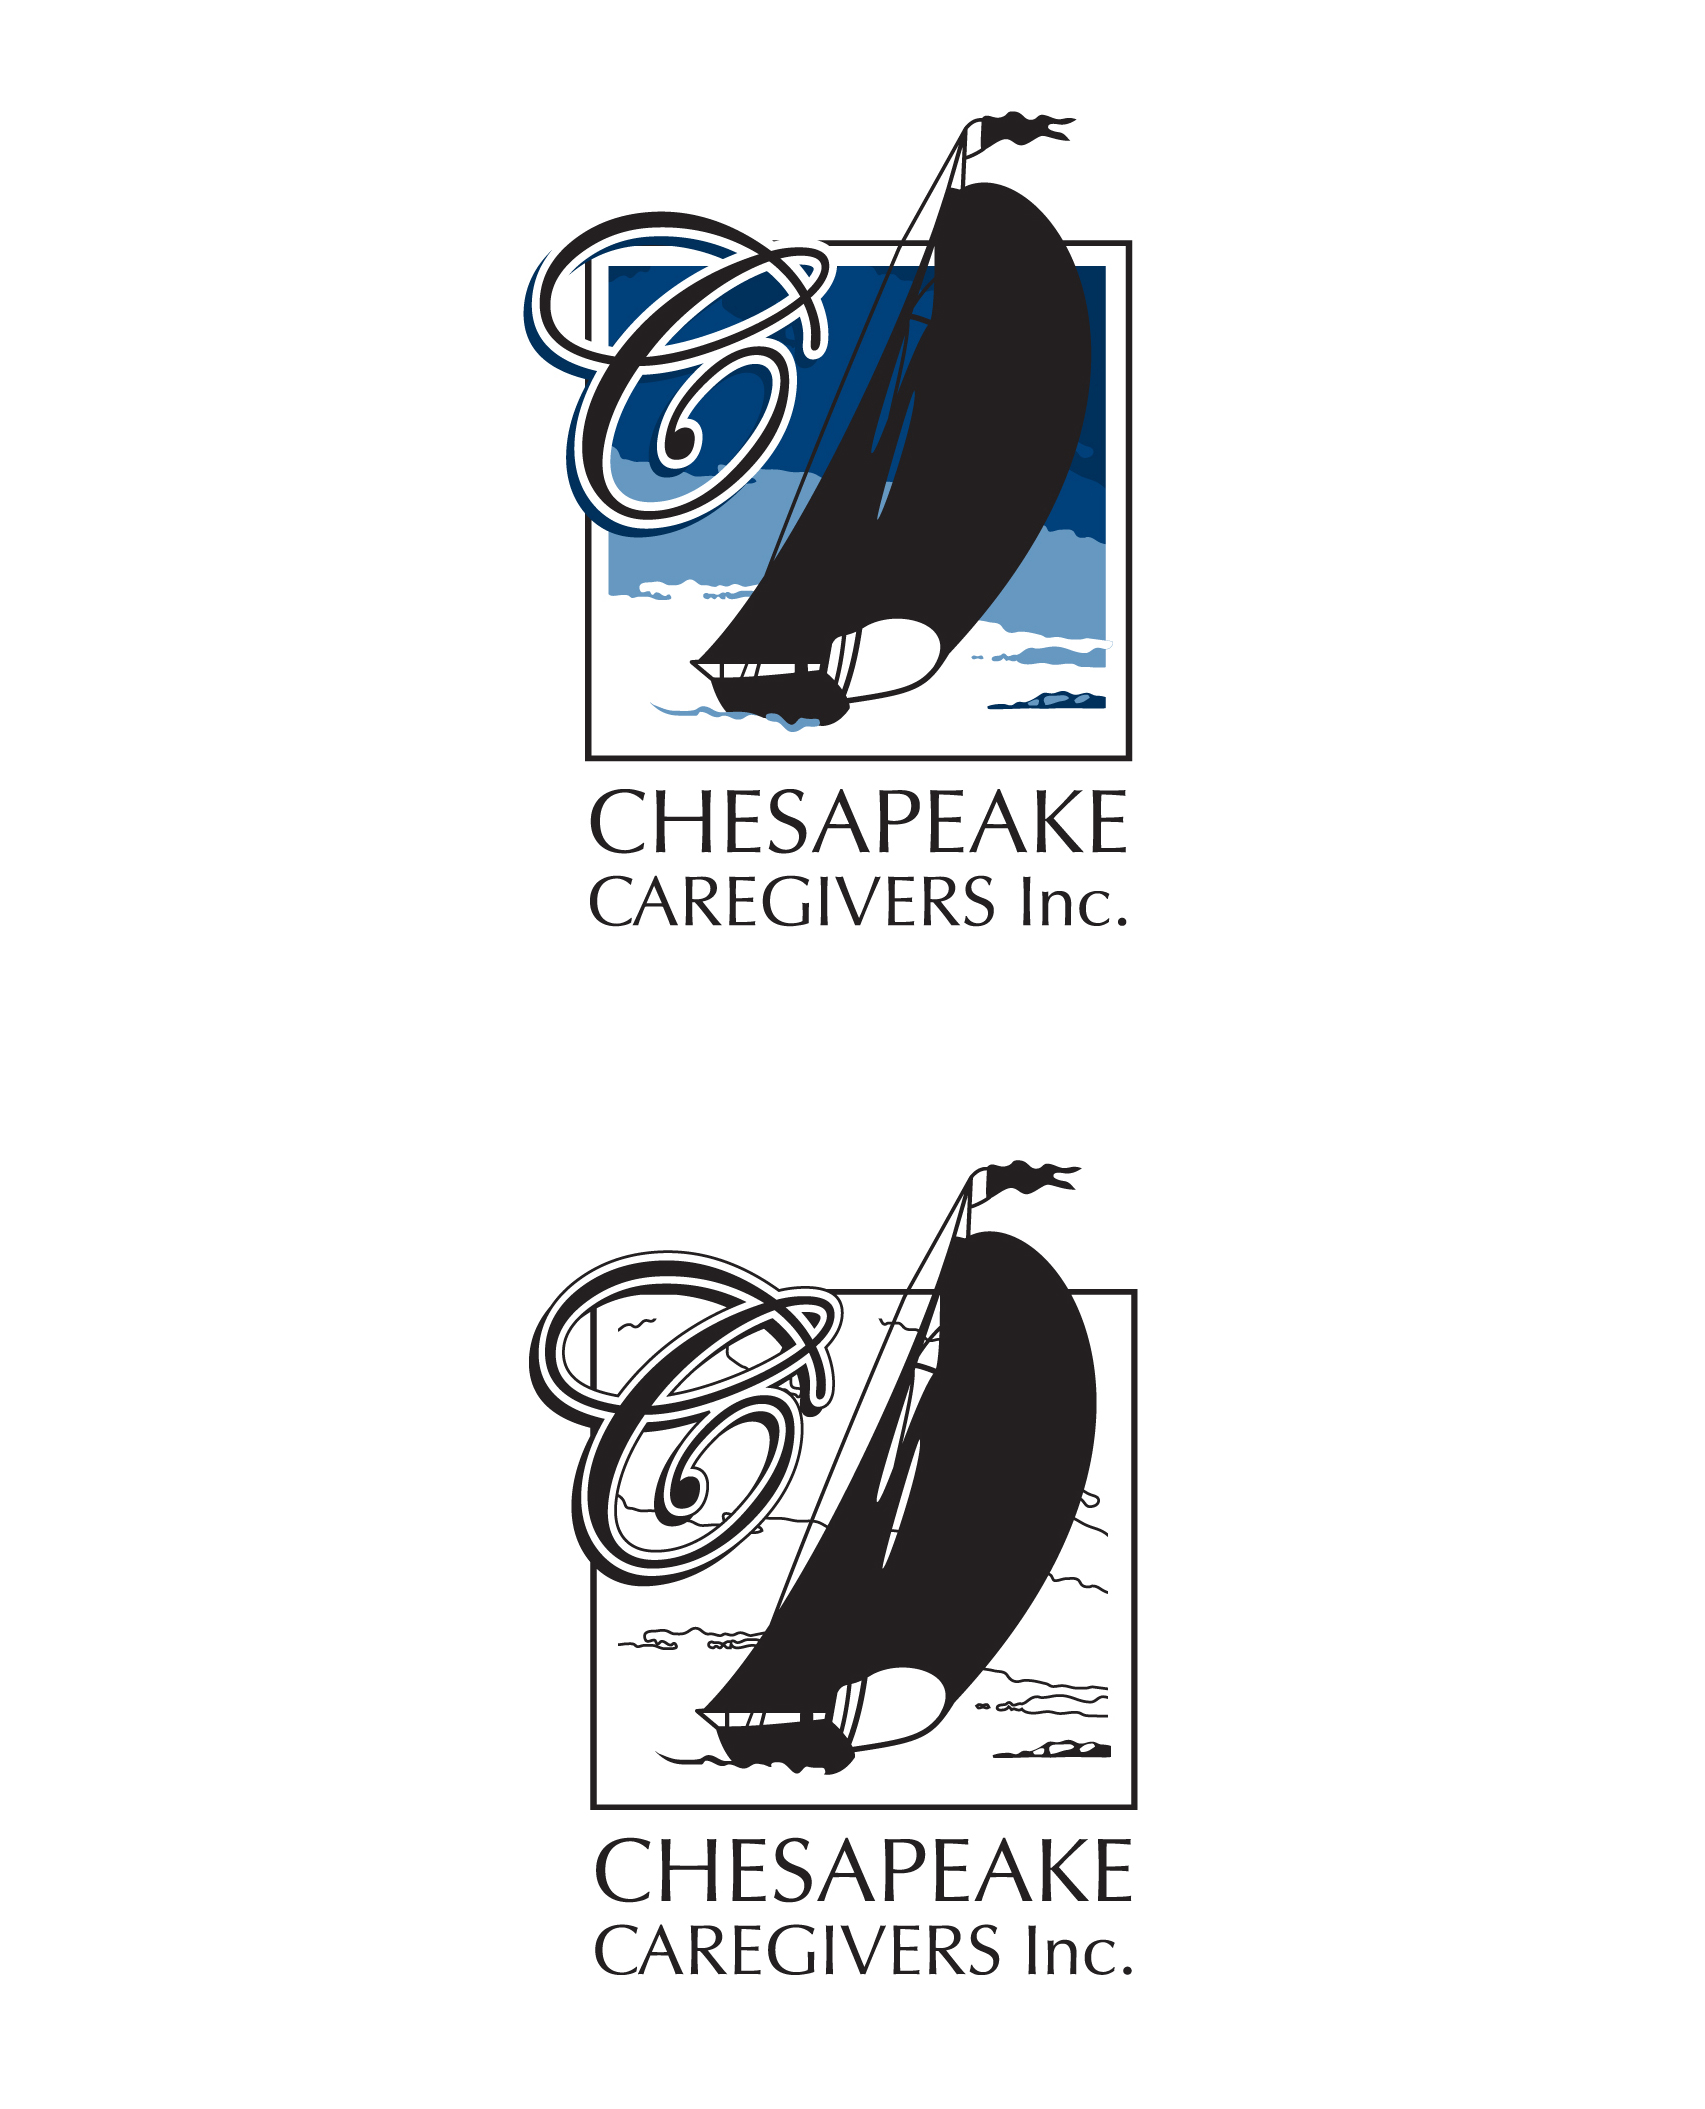 Chesapeake Caregivers, Inc. logo 2